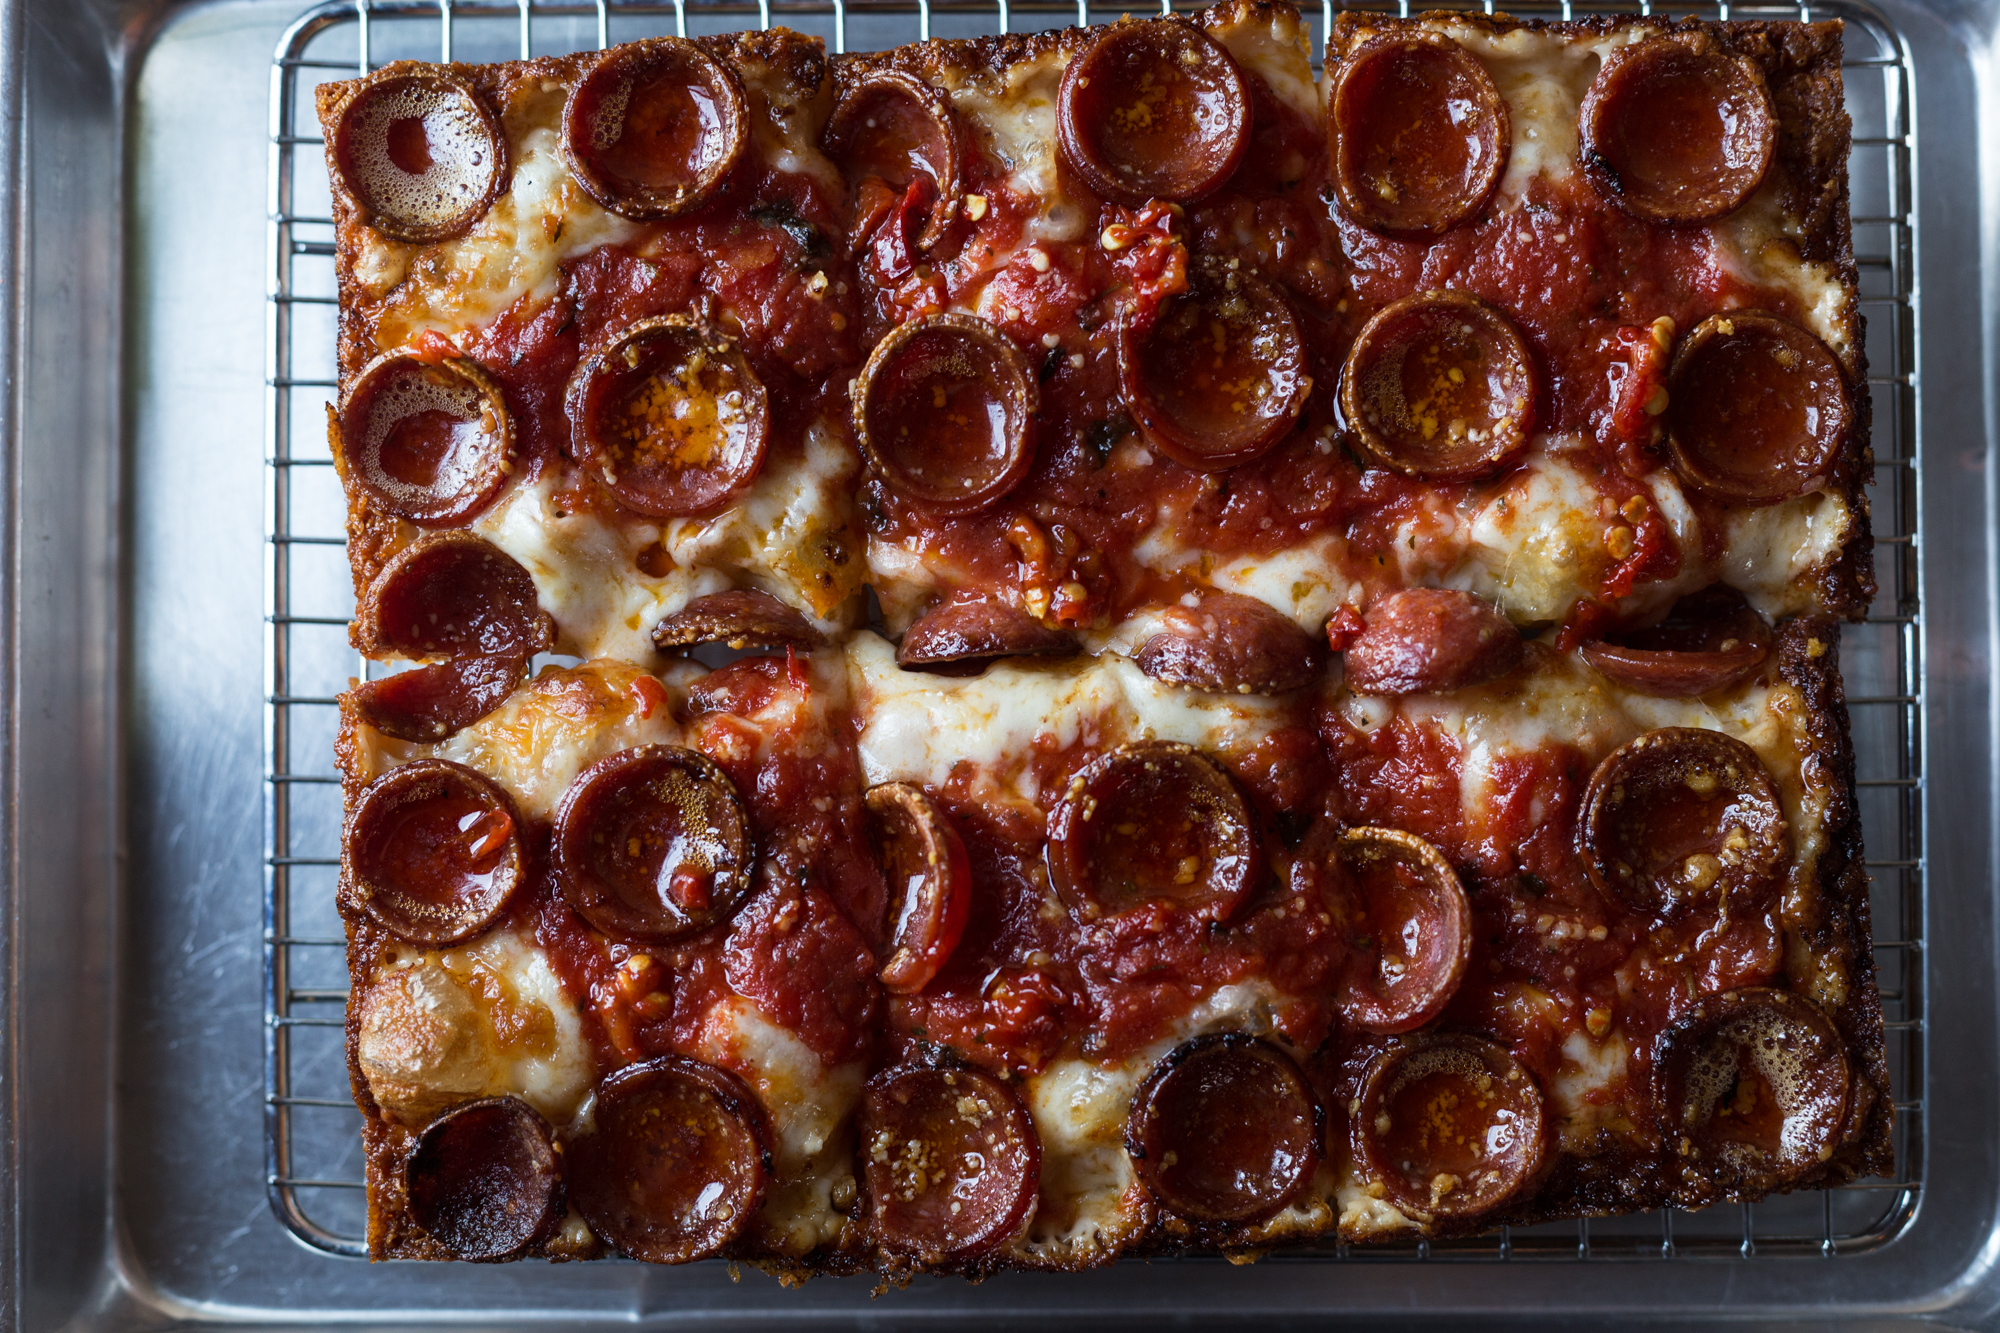 Emily's Detroit-style pizza